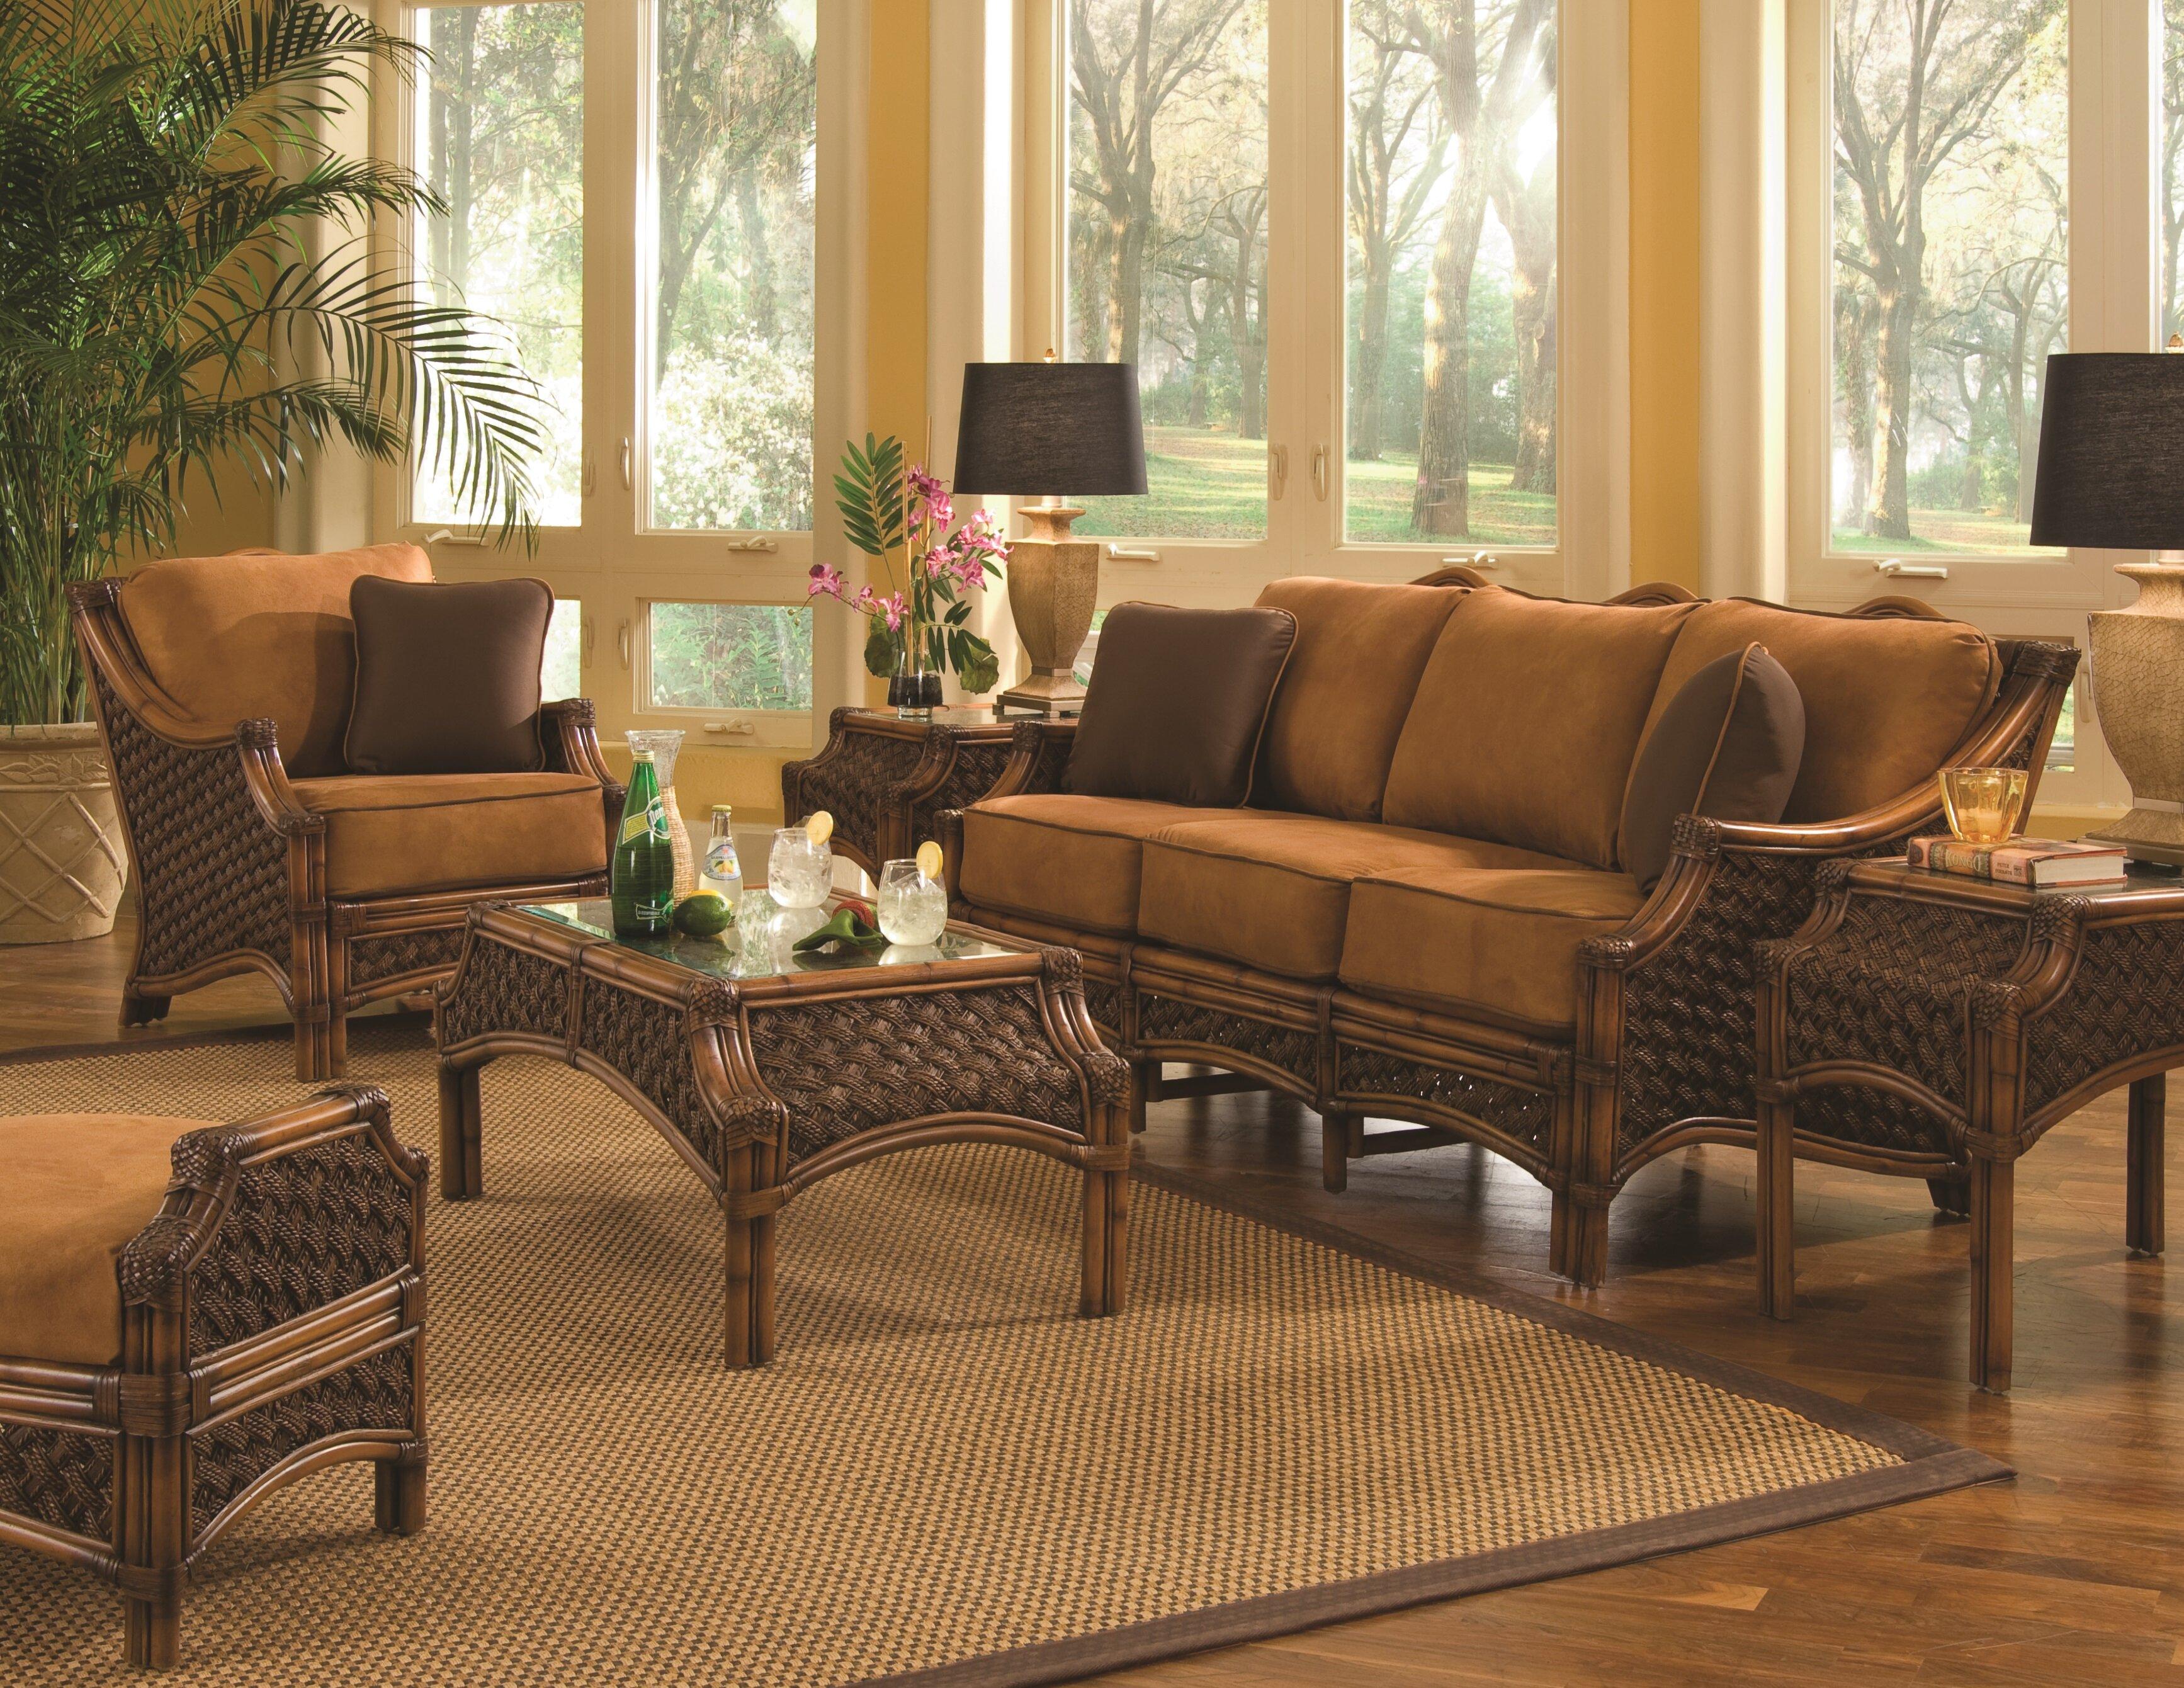 Bay Isle Home Schmitz 5 Piece Conservatory Living Room Set | Wayfair